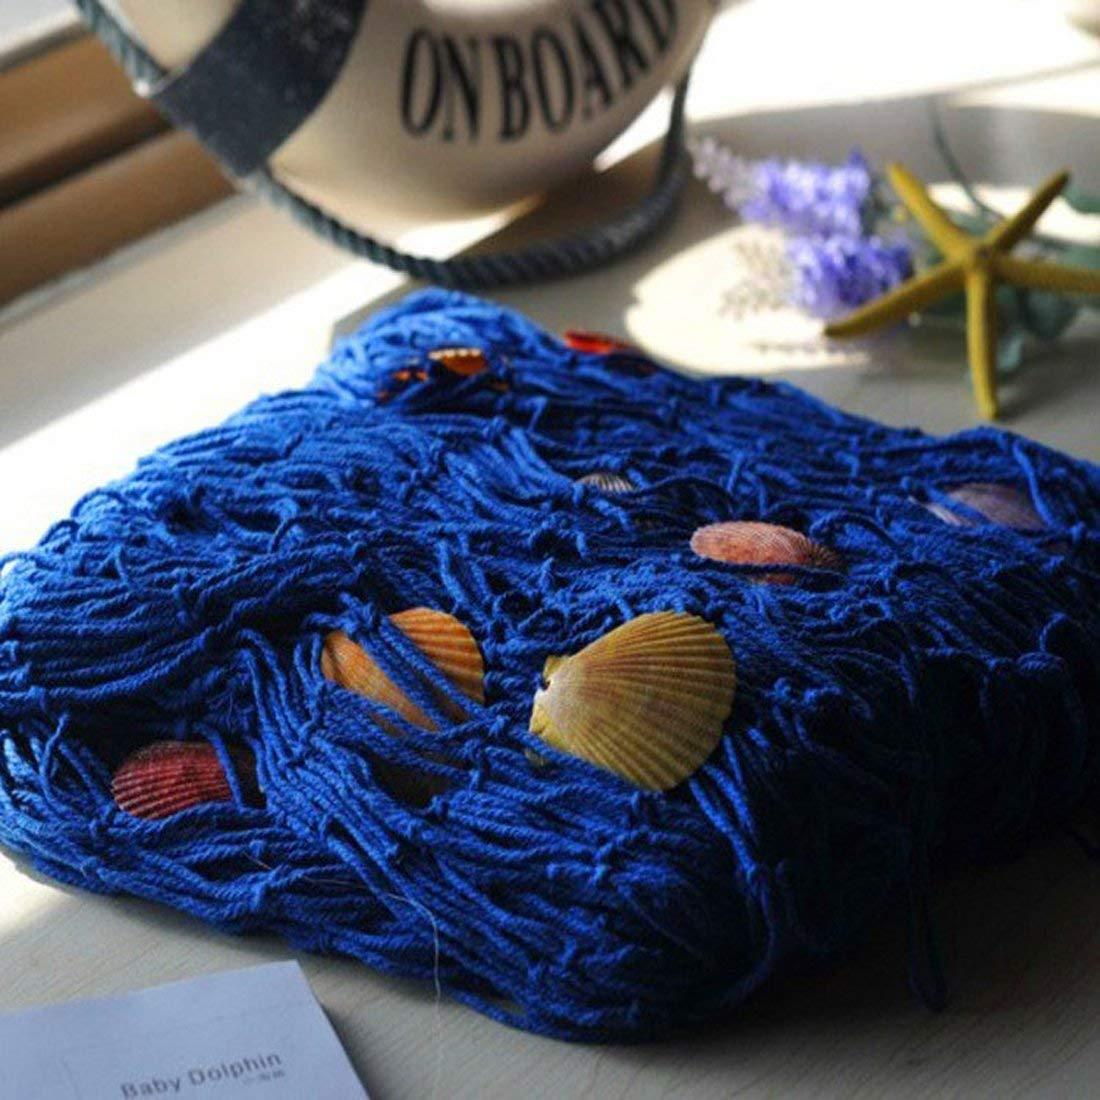 VEIOU Fish Net Decor Nautical Mediterranean Style Home Wall Decorative With Shells (Blue)